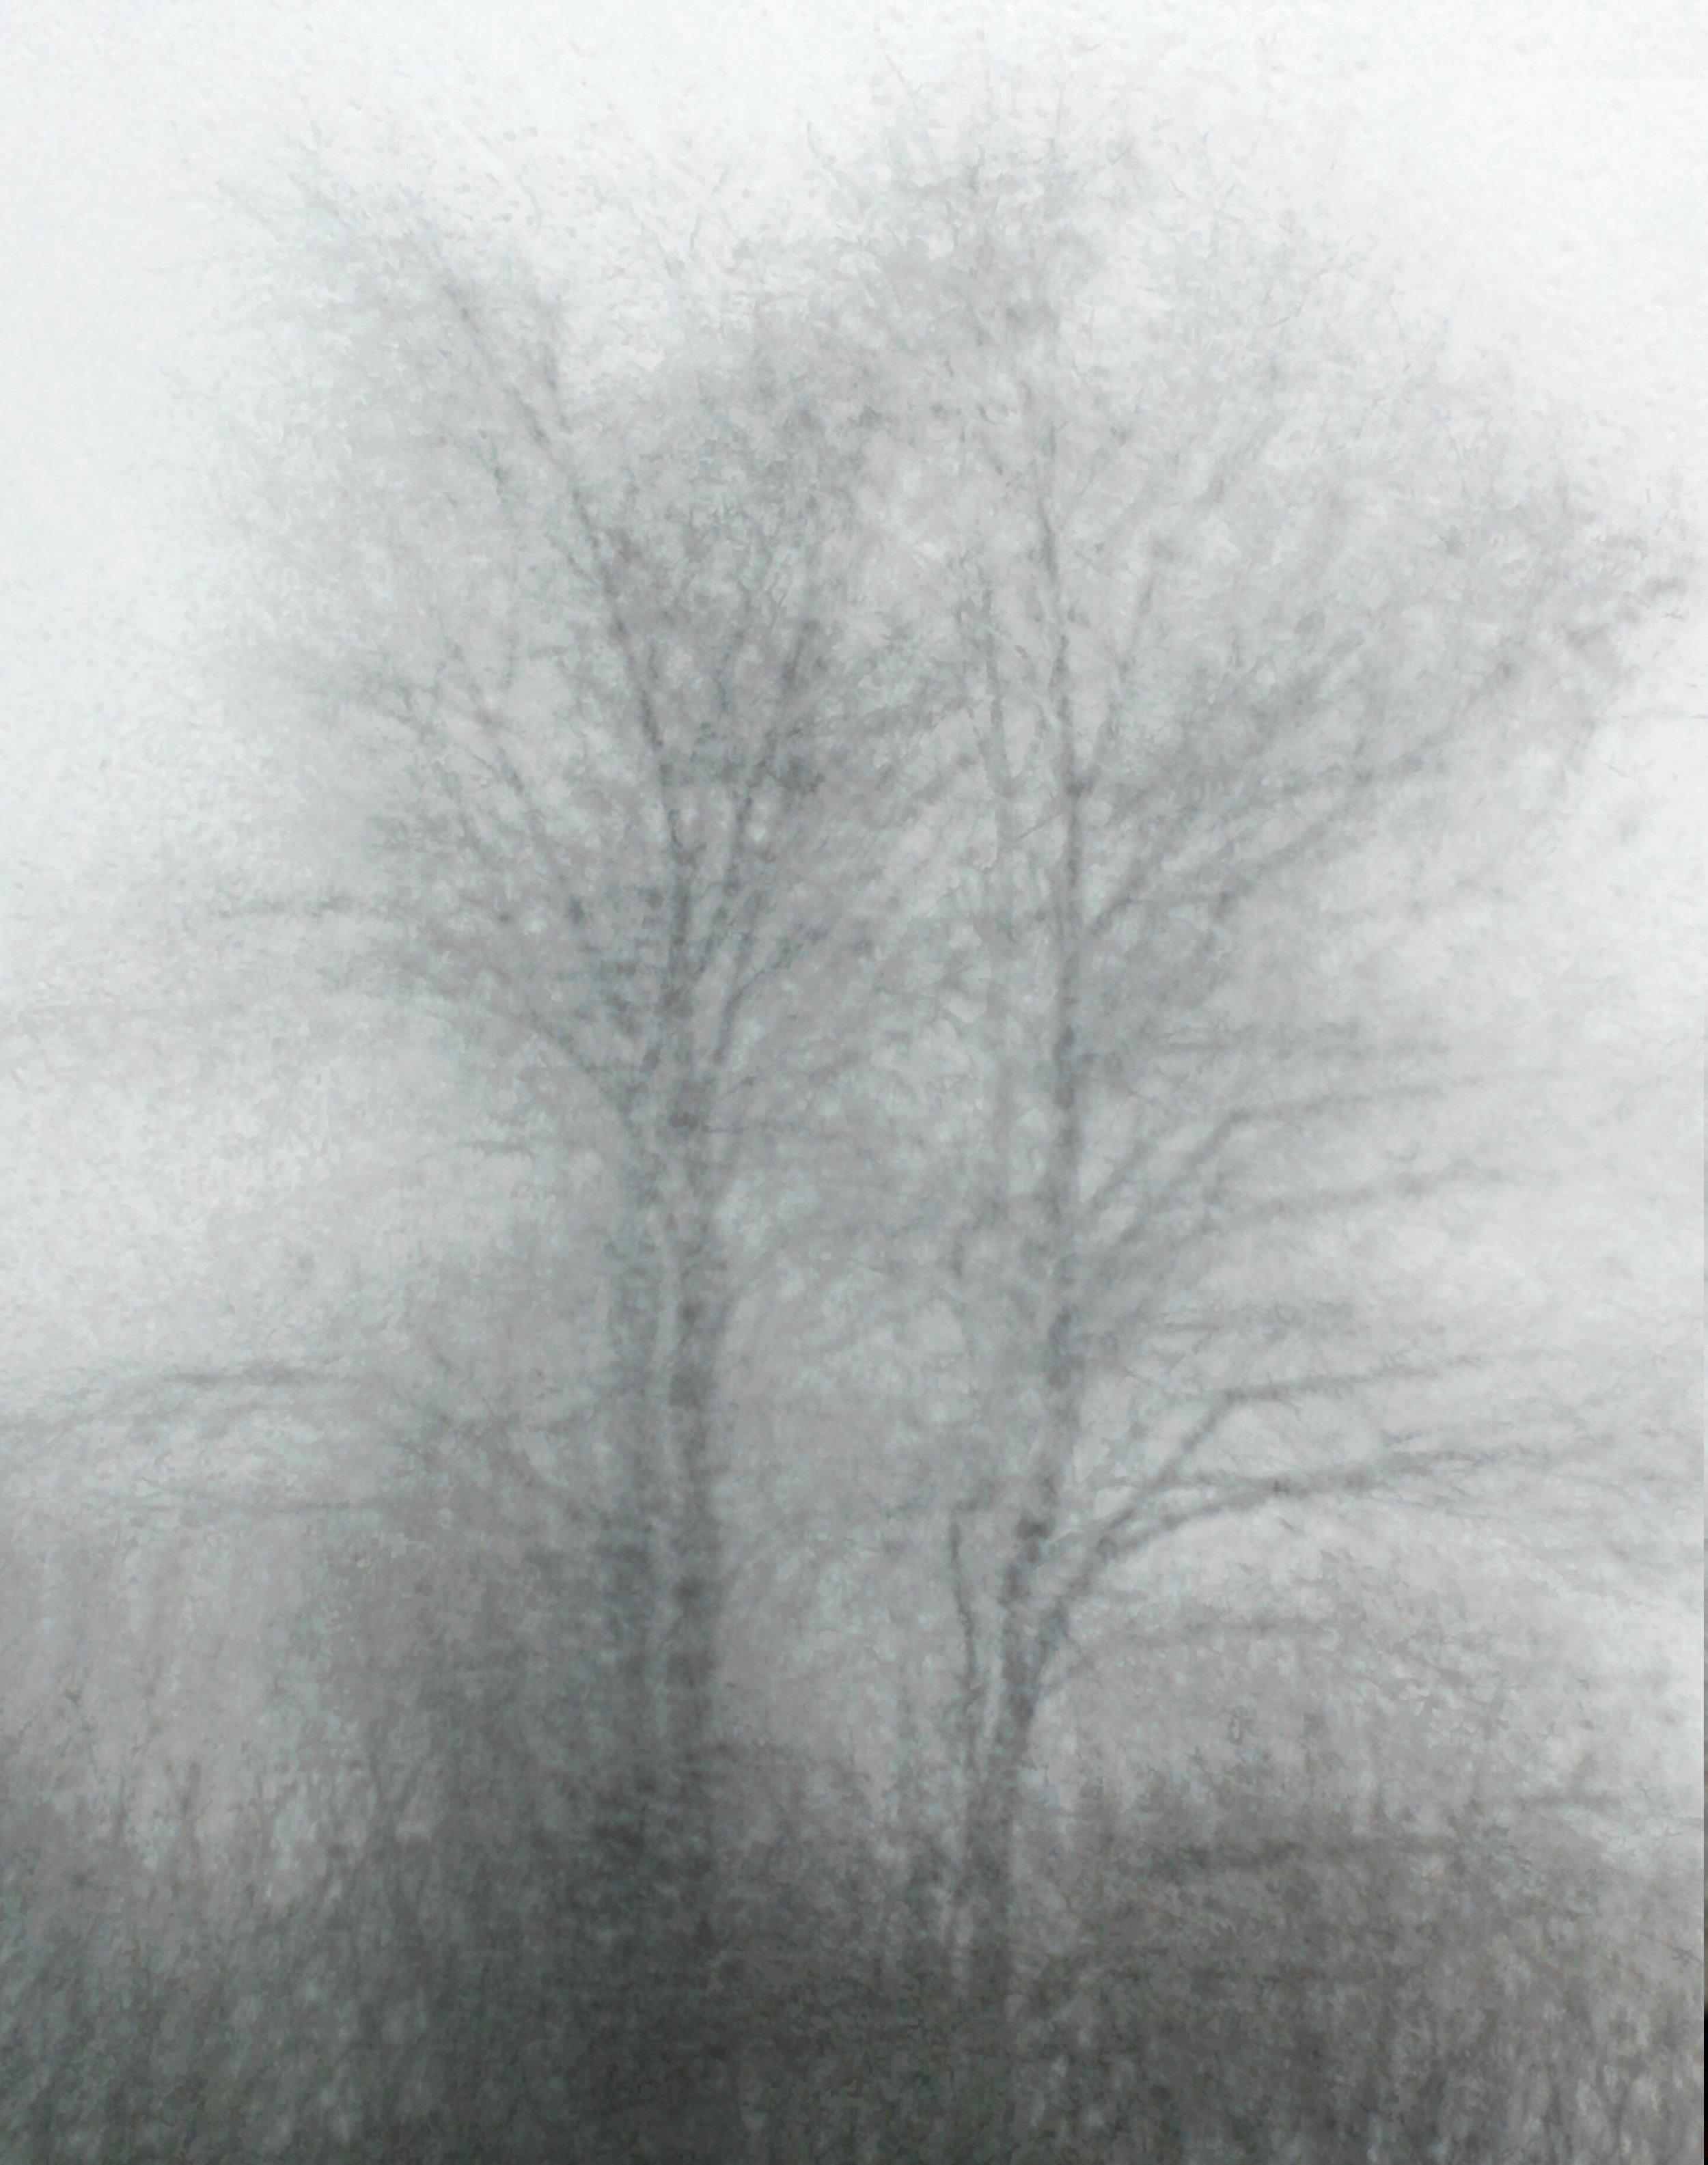 trees-rain.jpg